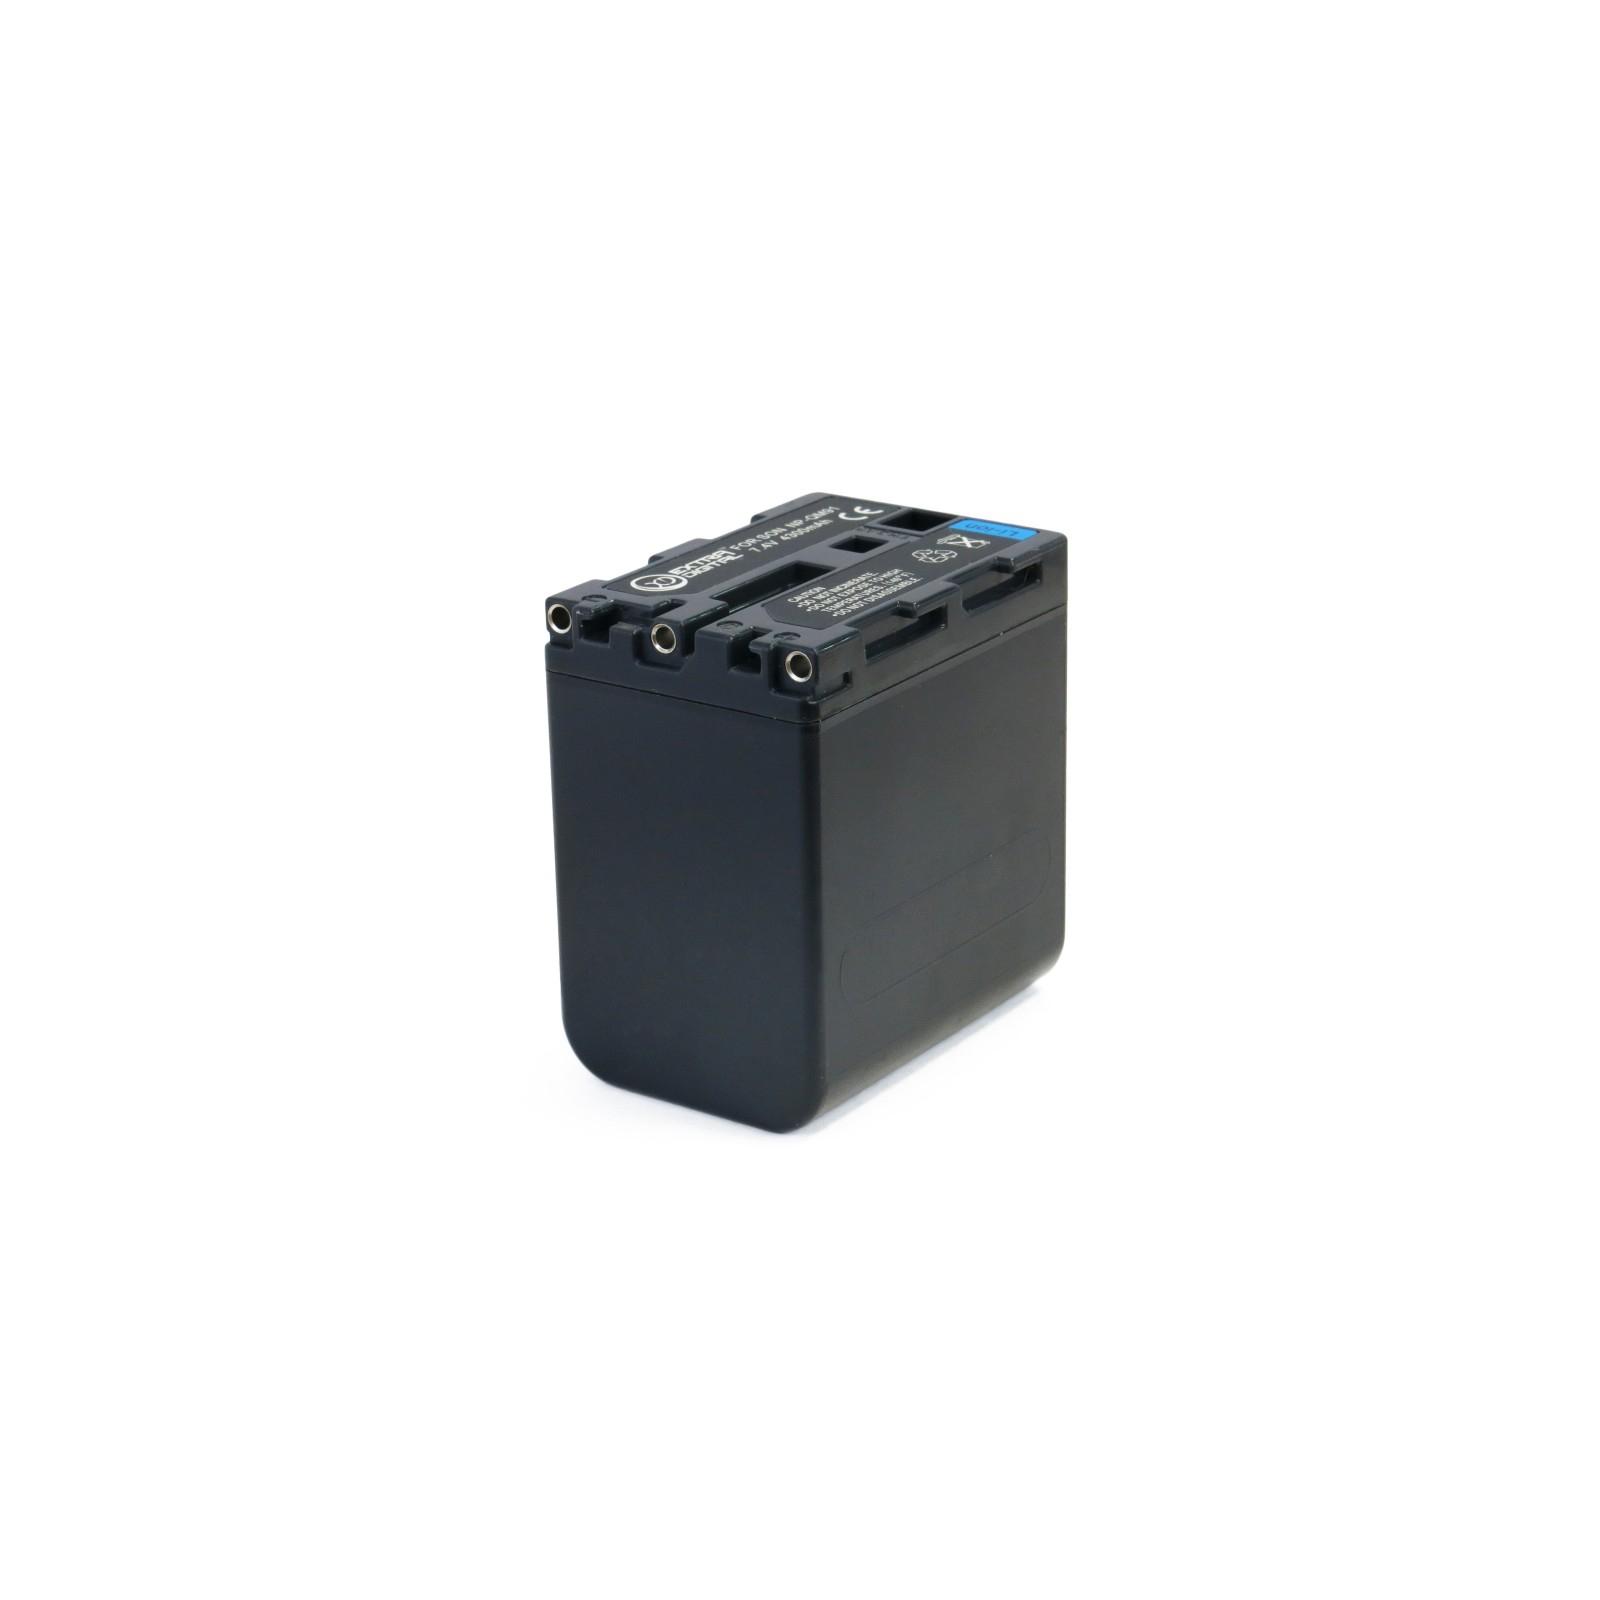 Аккумулятор к фото/видео EXTRADIGITAL Sony NP-QM91 (DV00DV1030) изображение 4